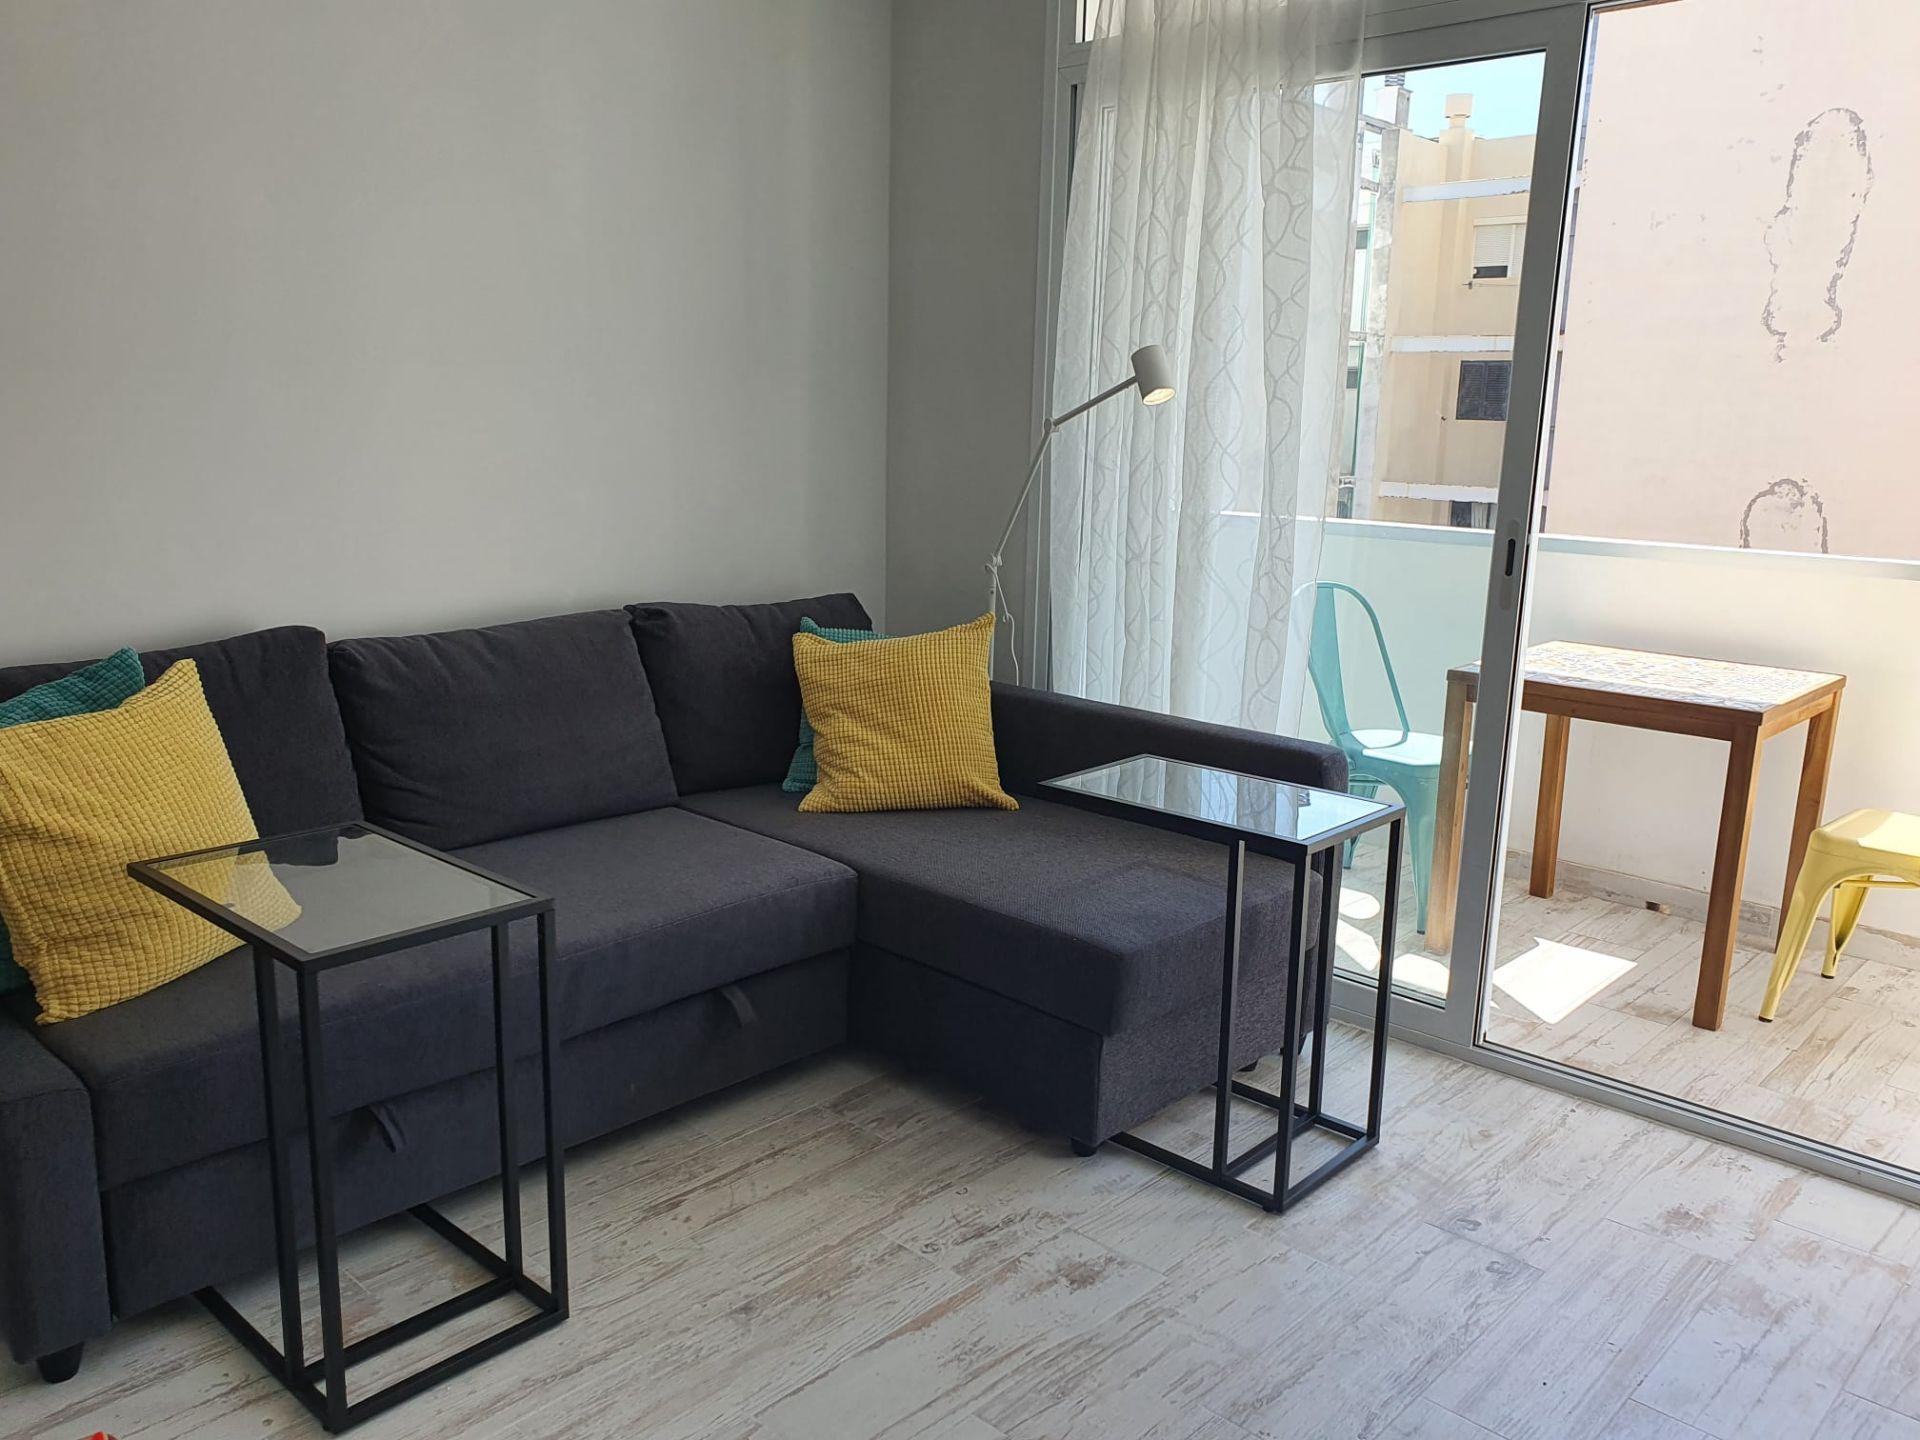 Estudio en Las Palmas de Gran Canaria, Zona Canteras Plaza Farray, venta